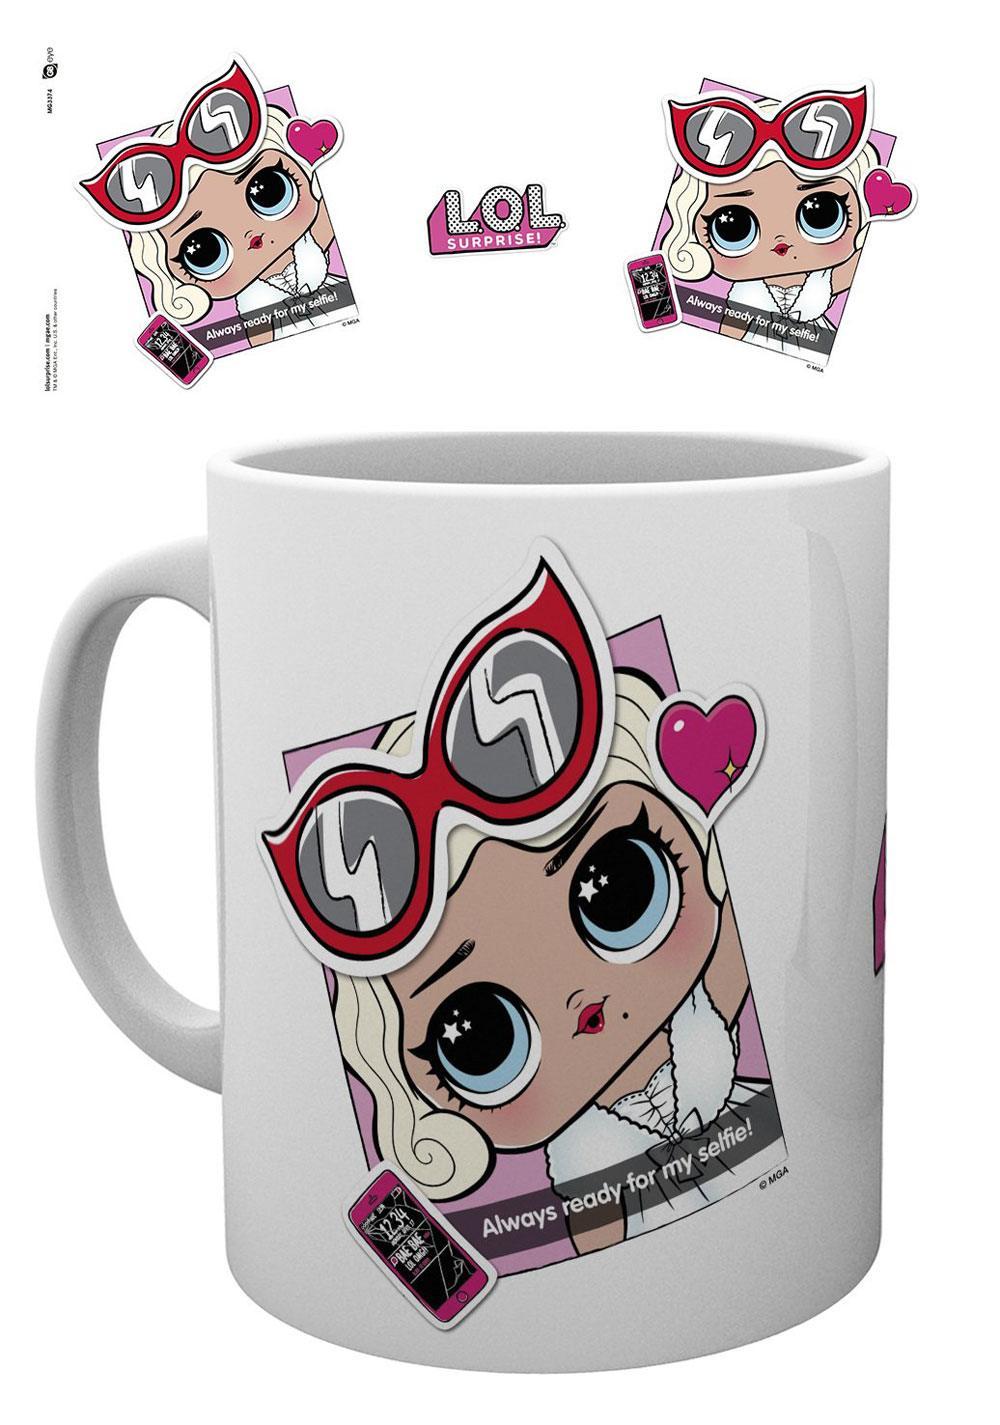 L.O.L. Surprise! Mug Selfie